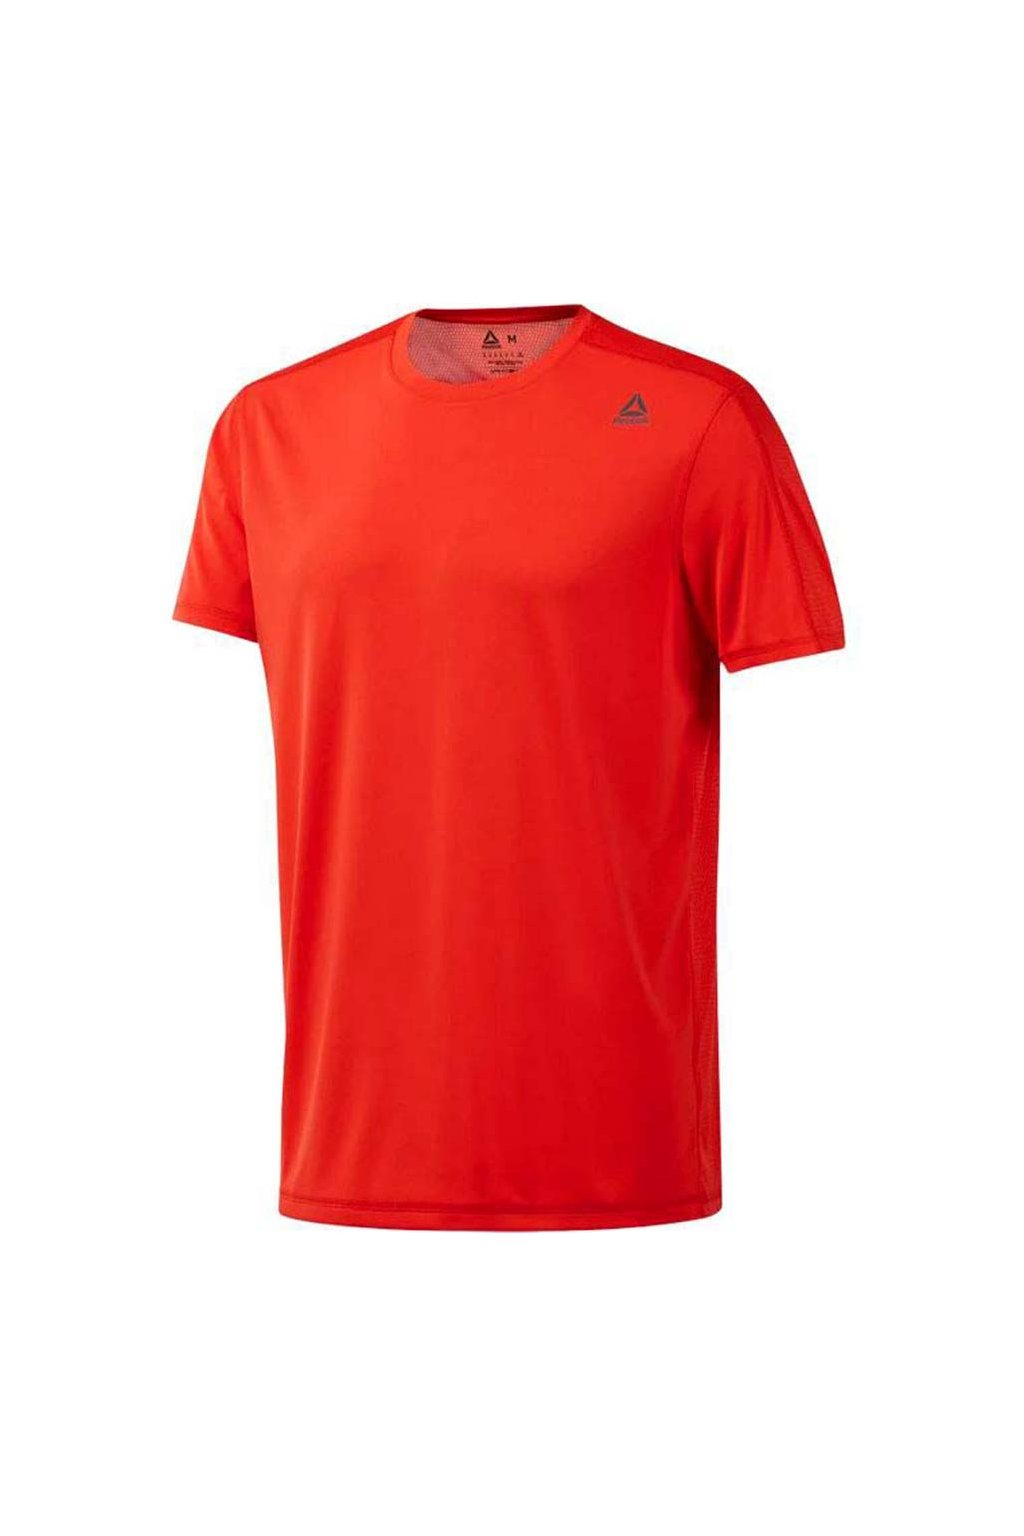 Pánske tričko Reebok Workout Tech Top červené DP6162